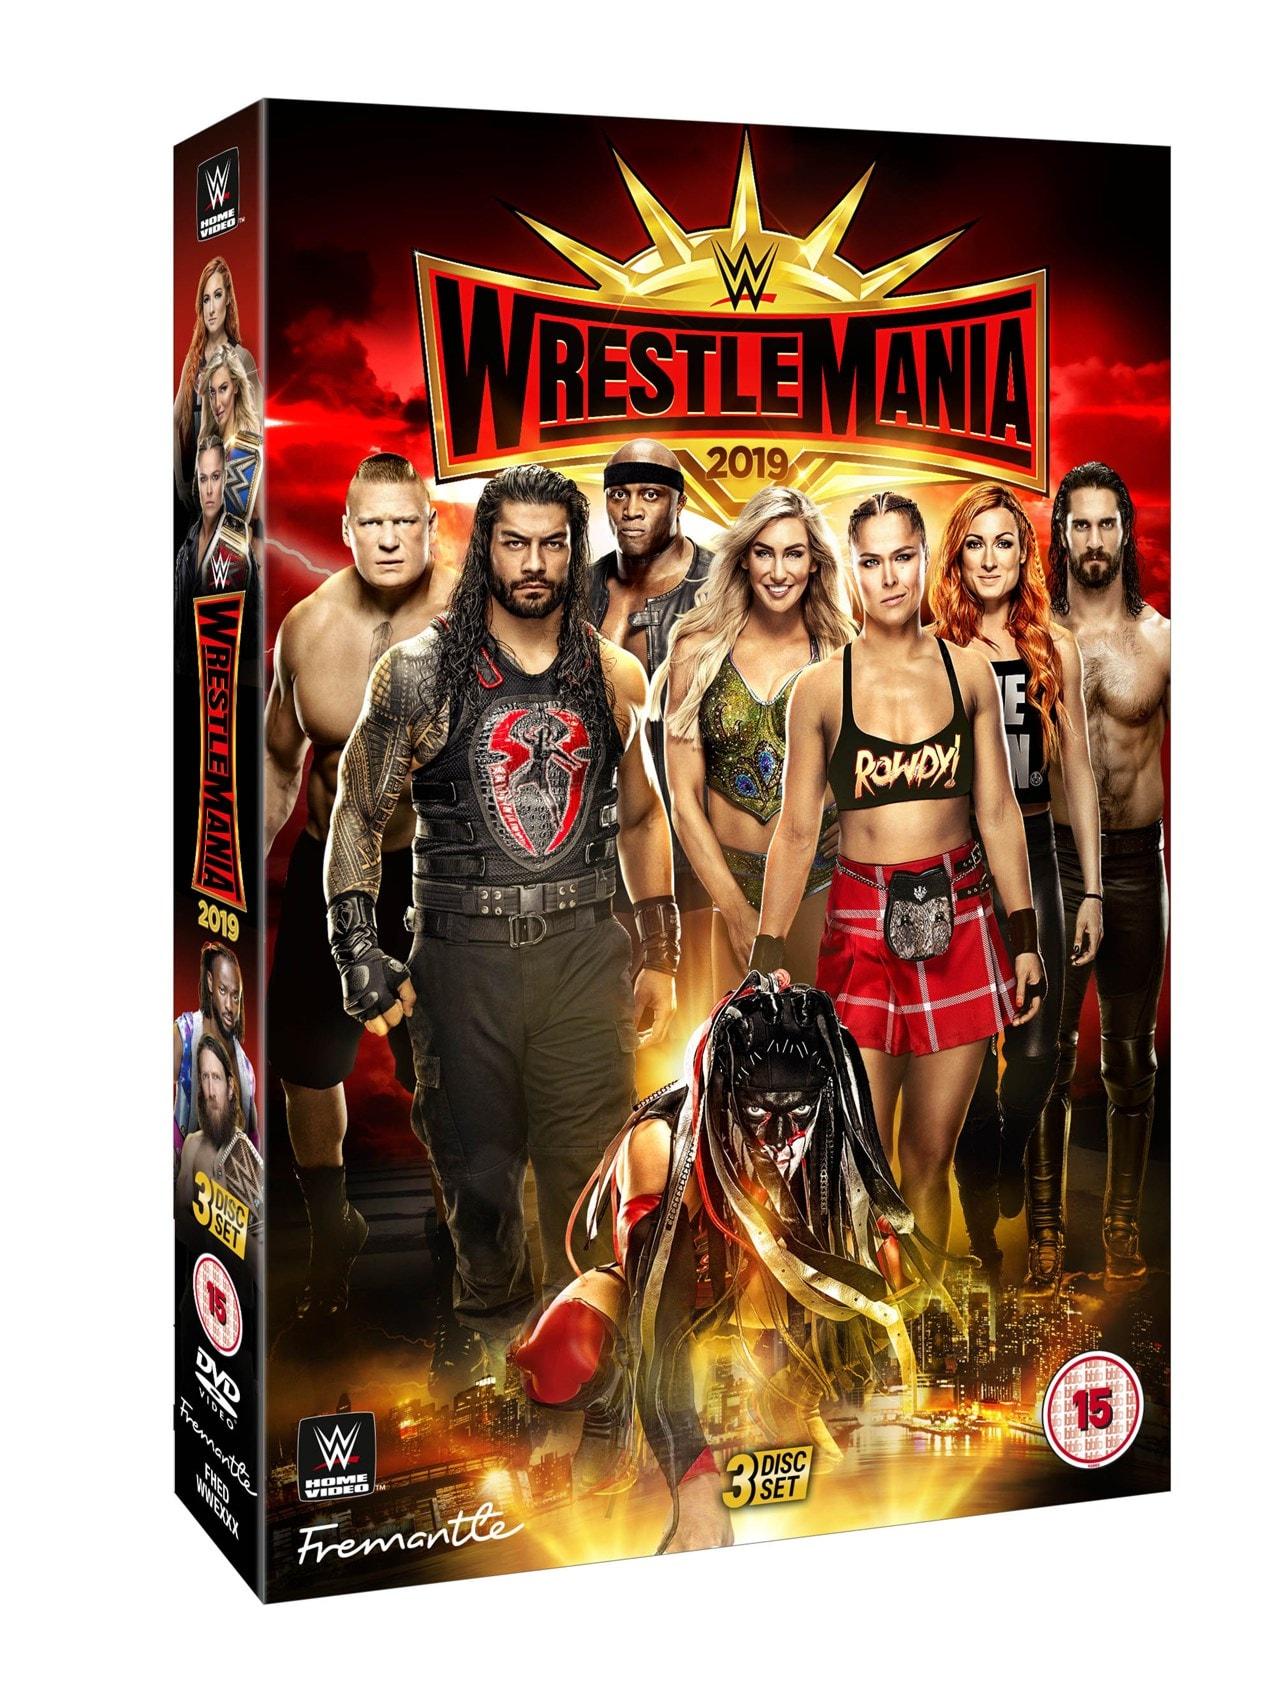 WWE: Wrestlemania 35 - 2